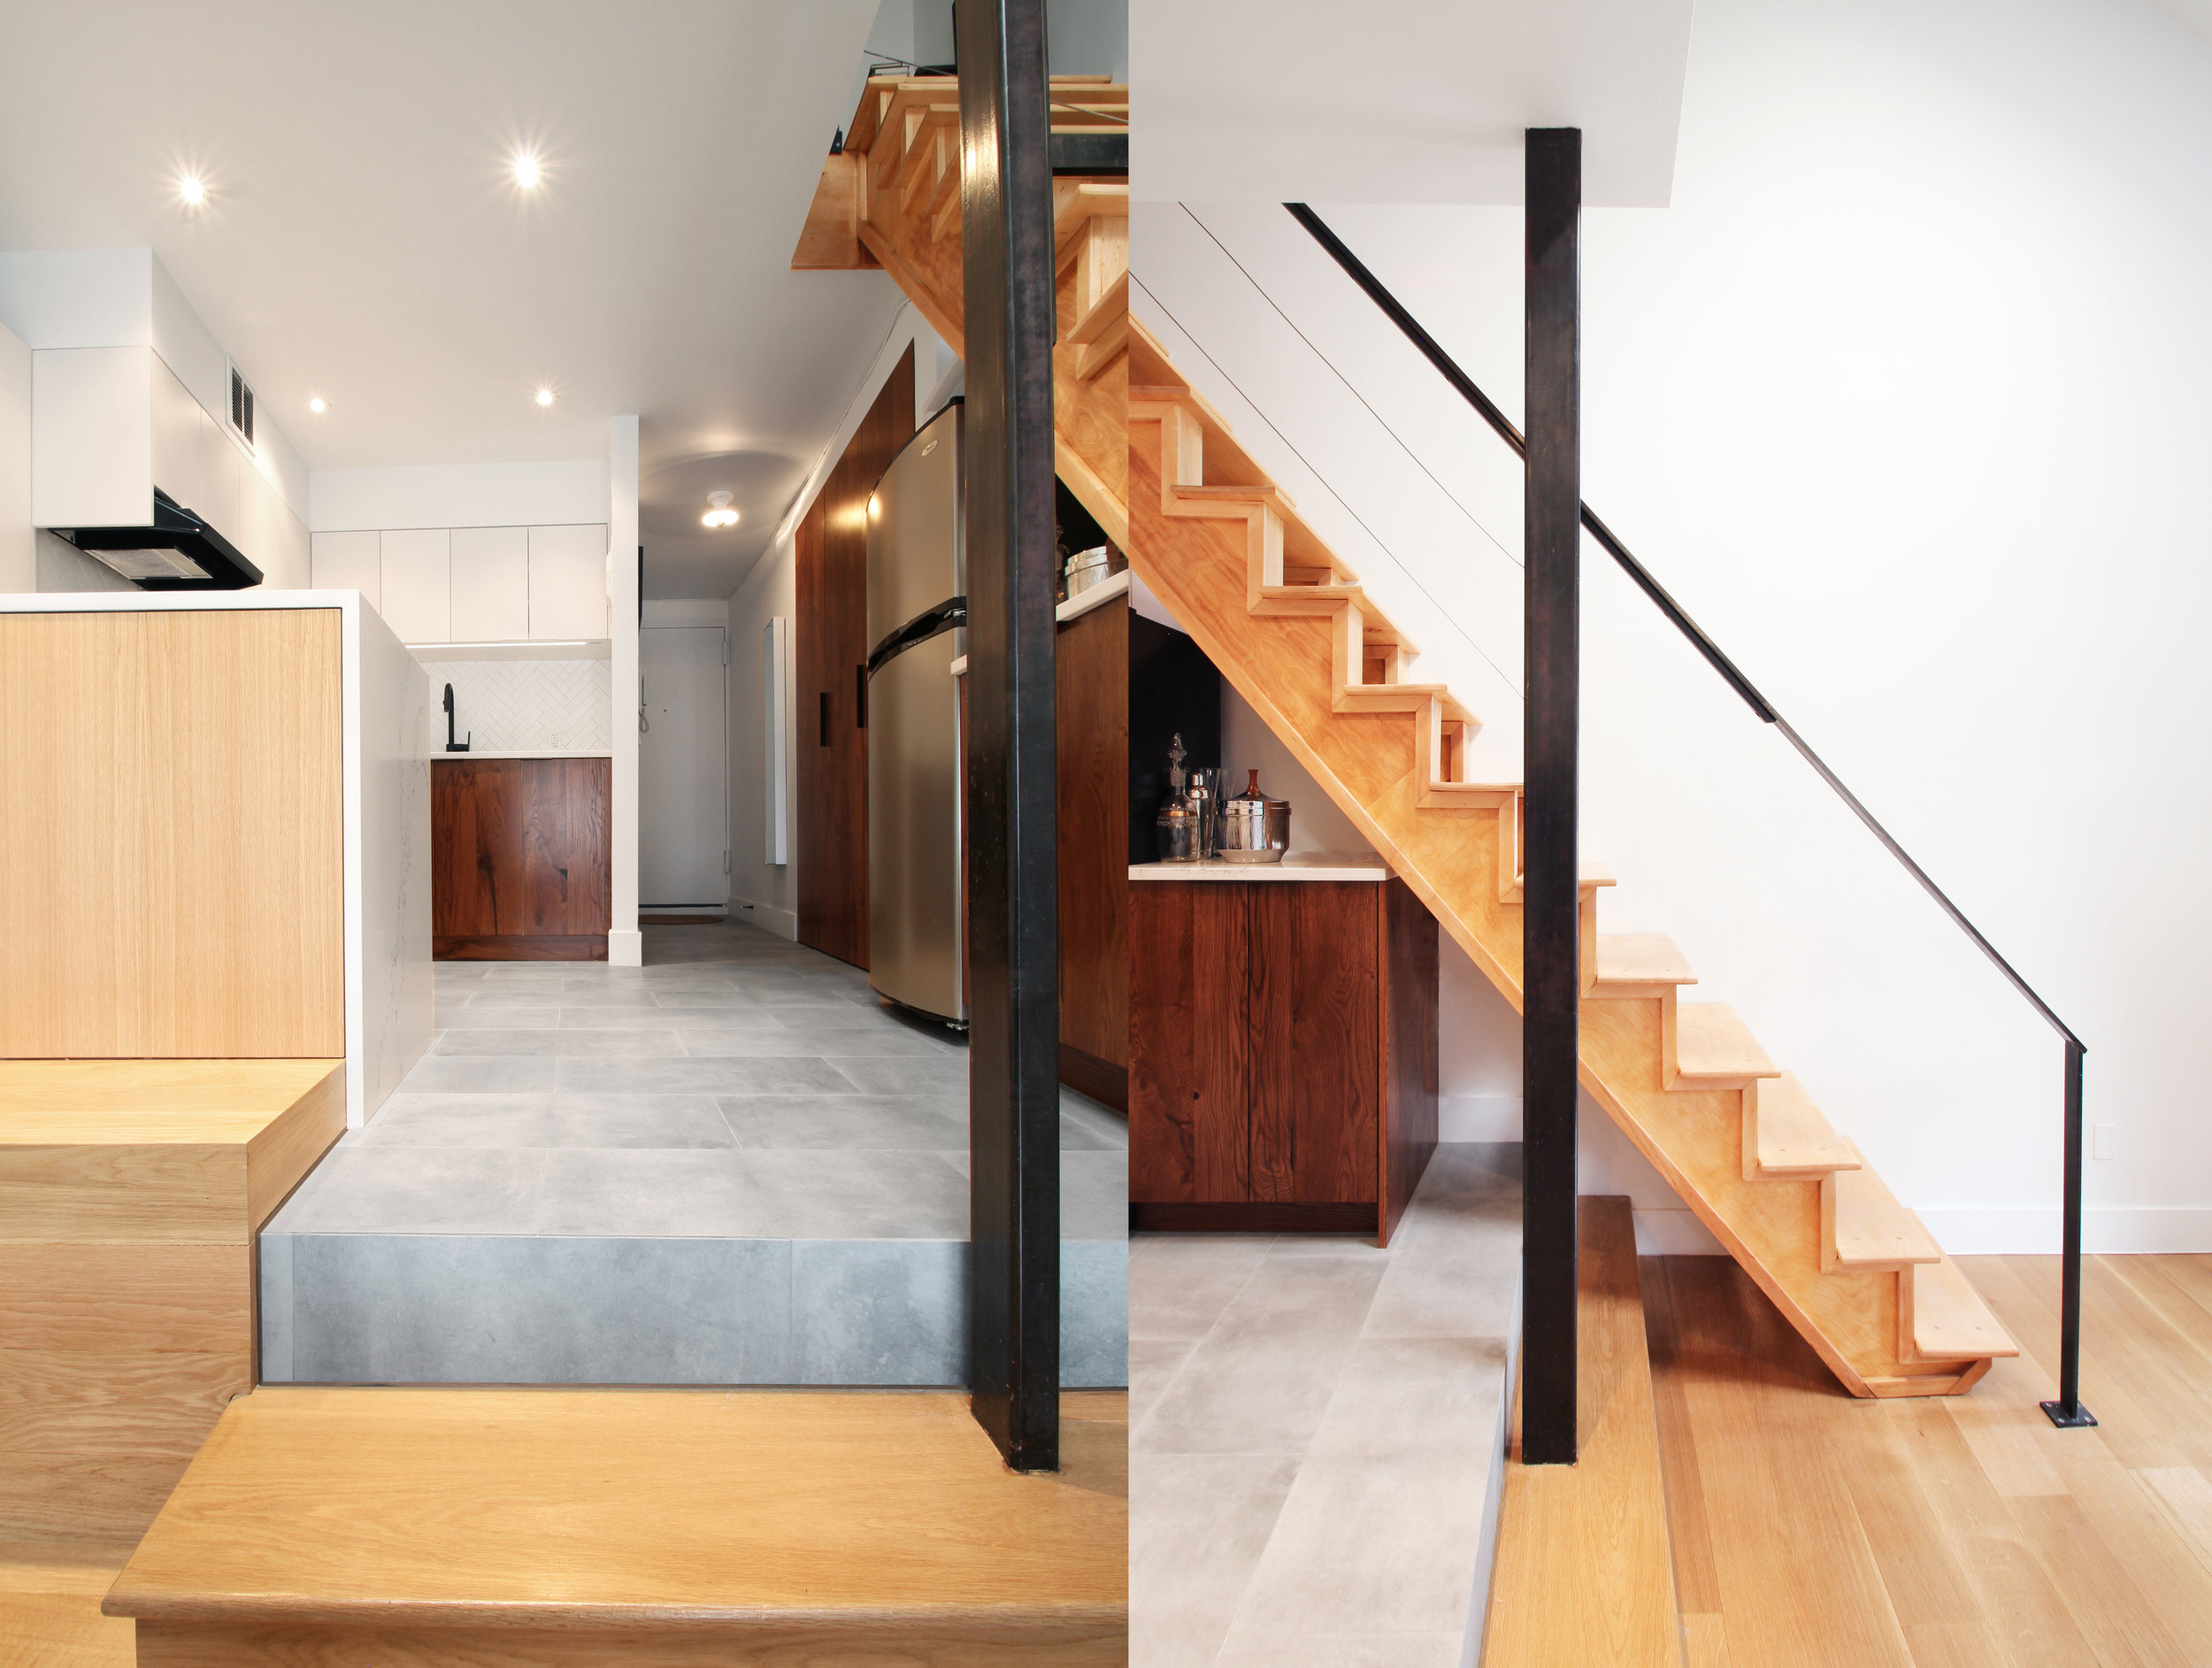 Vertical joined Stair.jpg